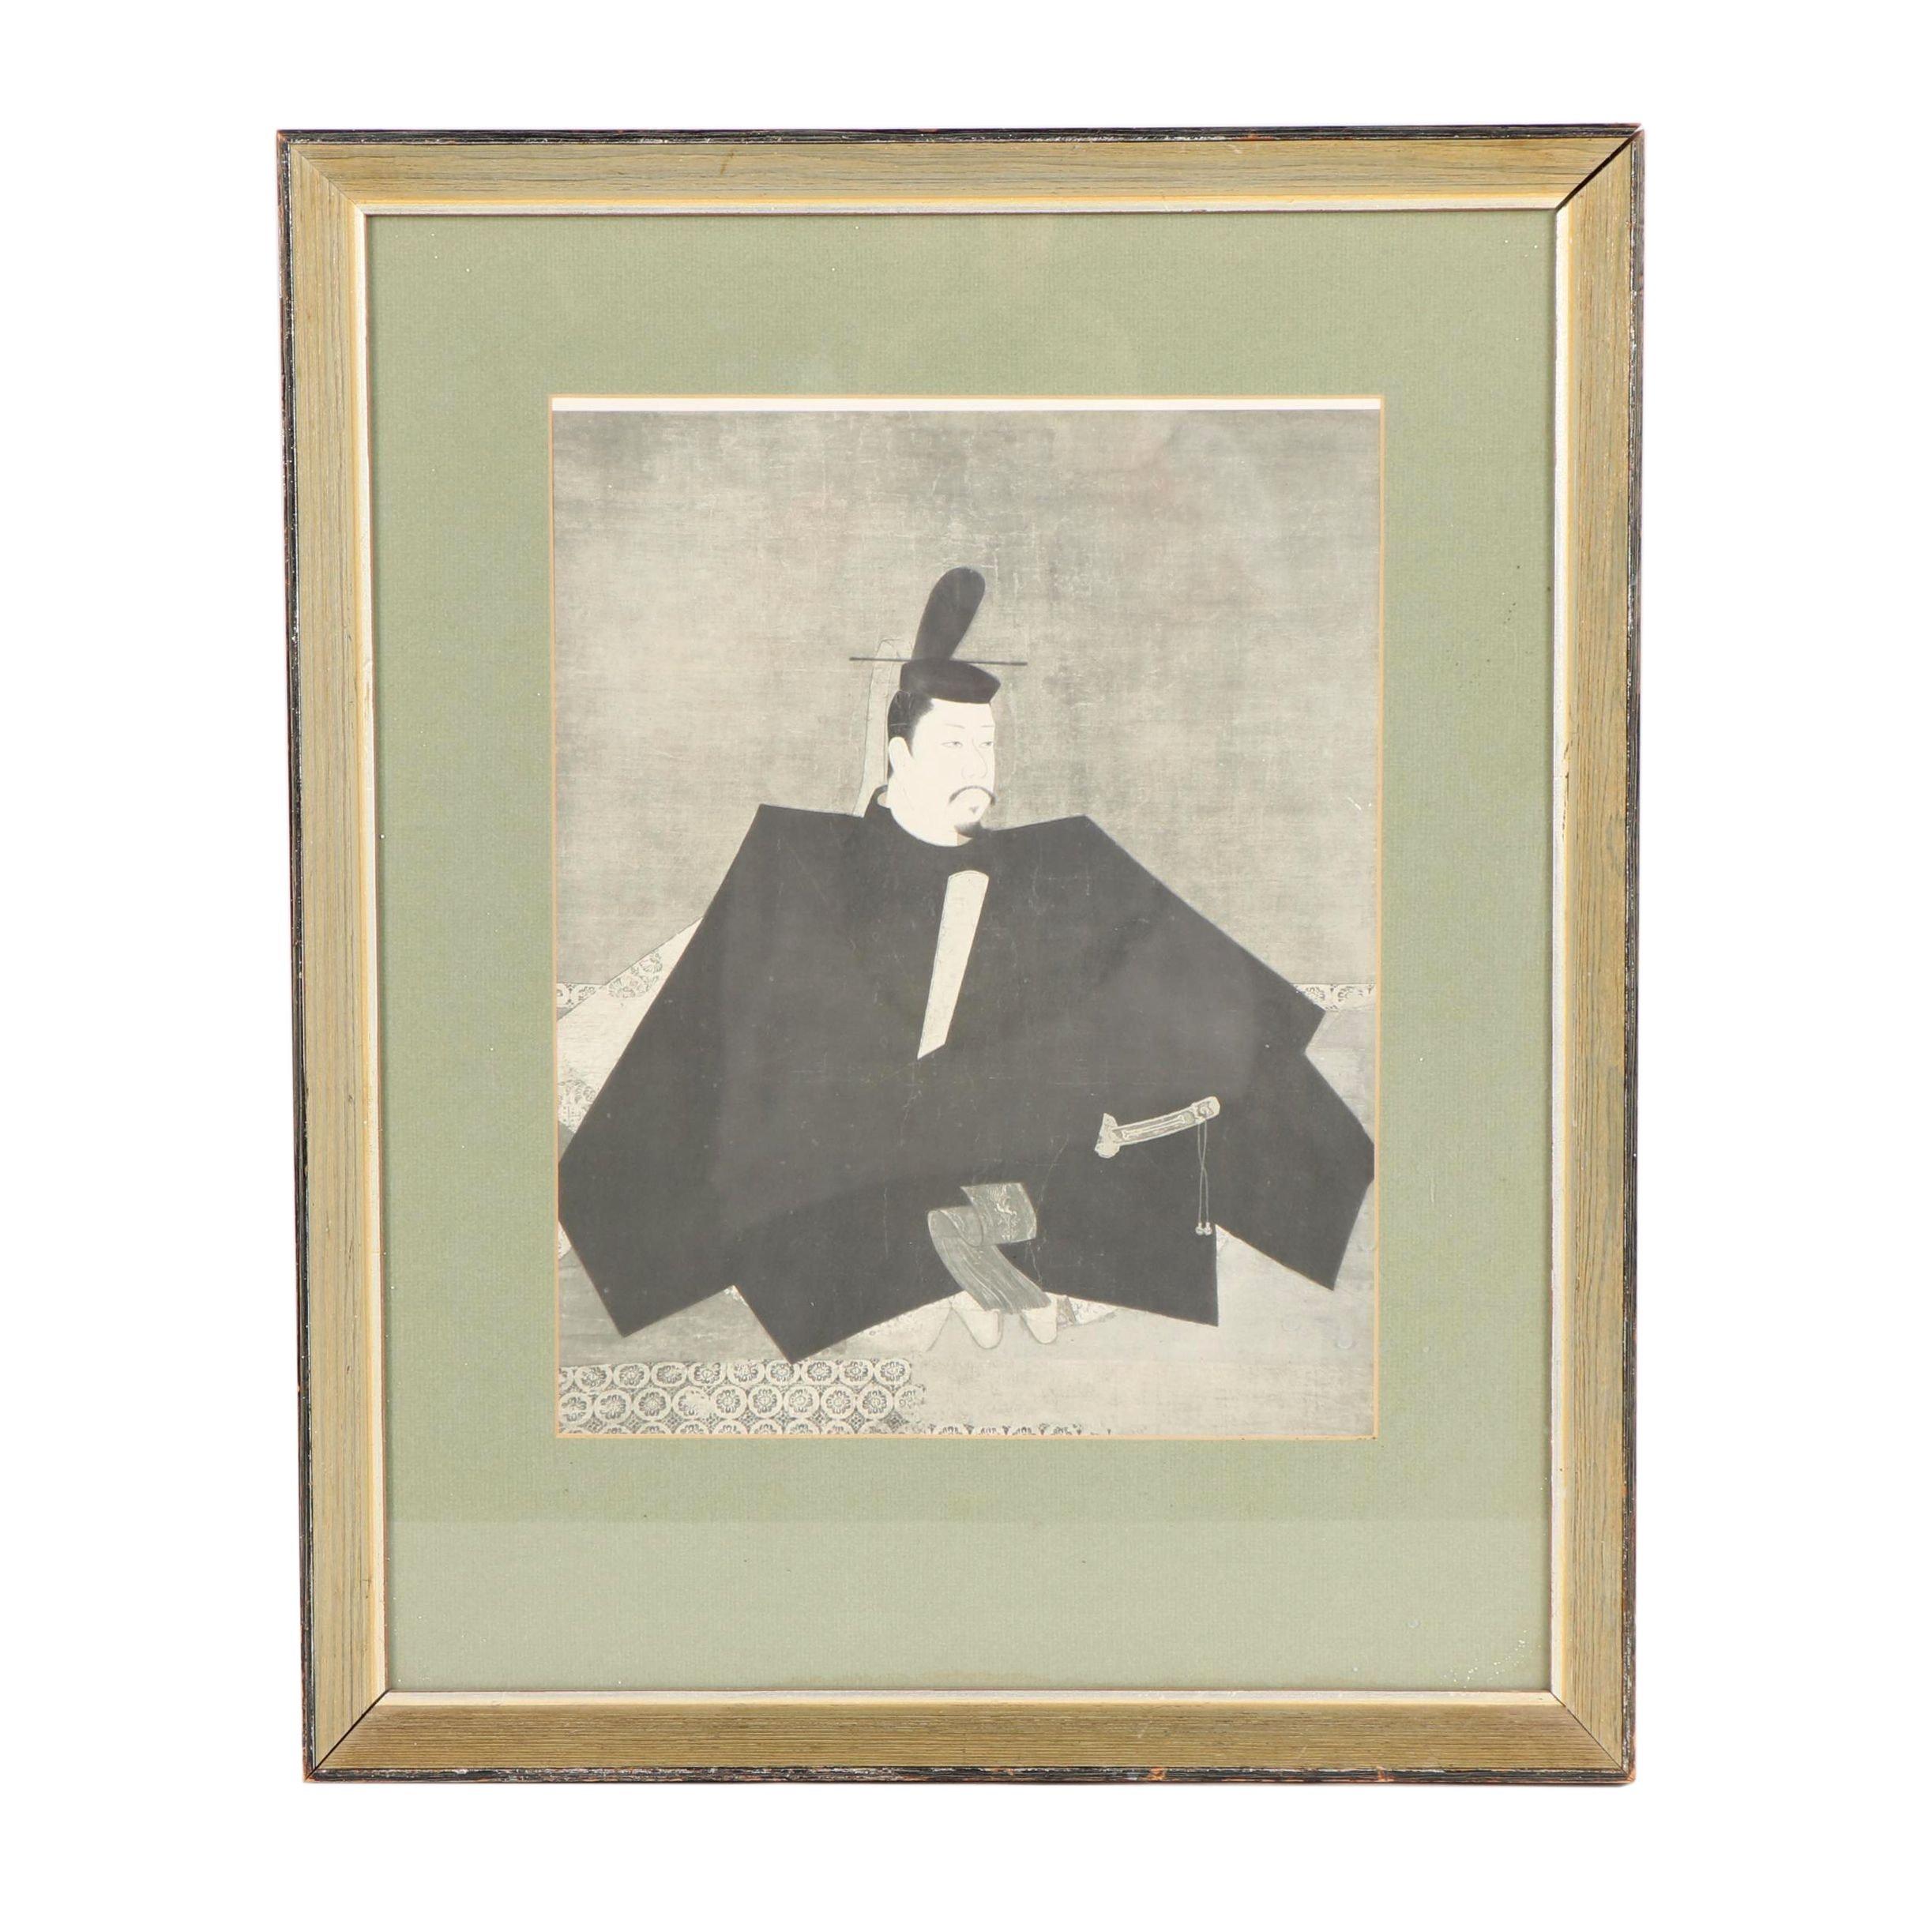 Offset Lithograph after Portrait of Minamoto Yoritomo